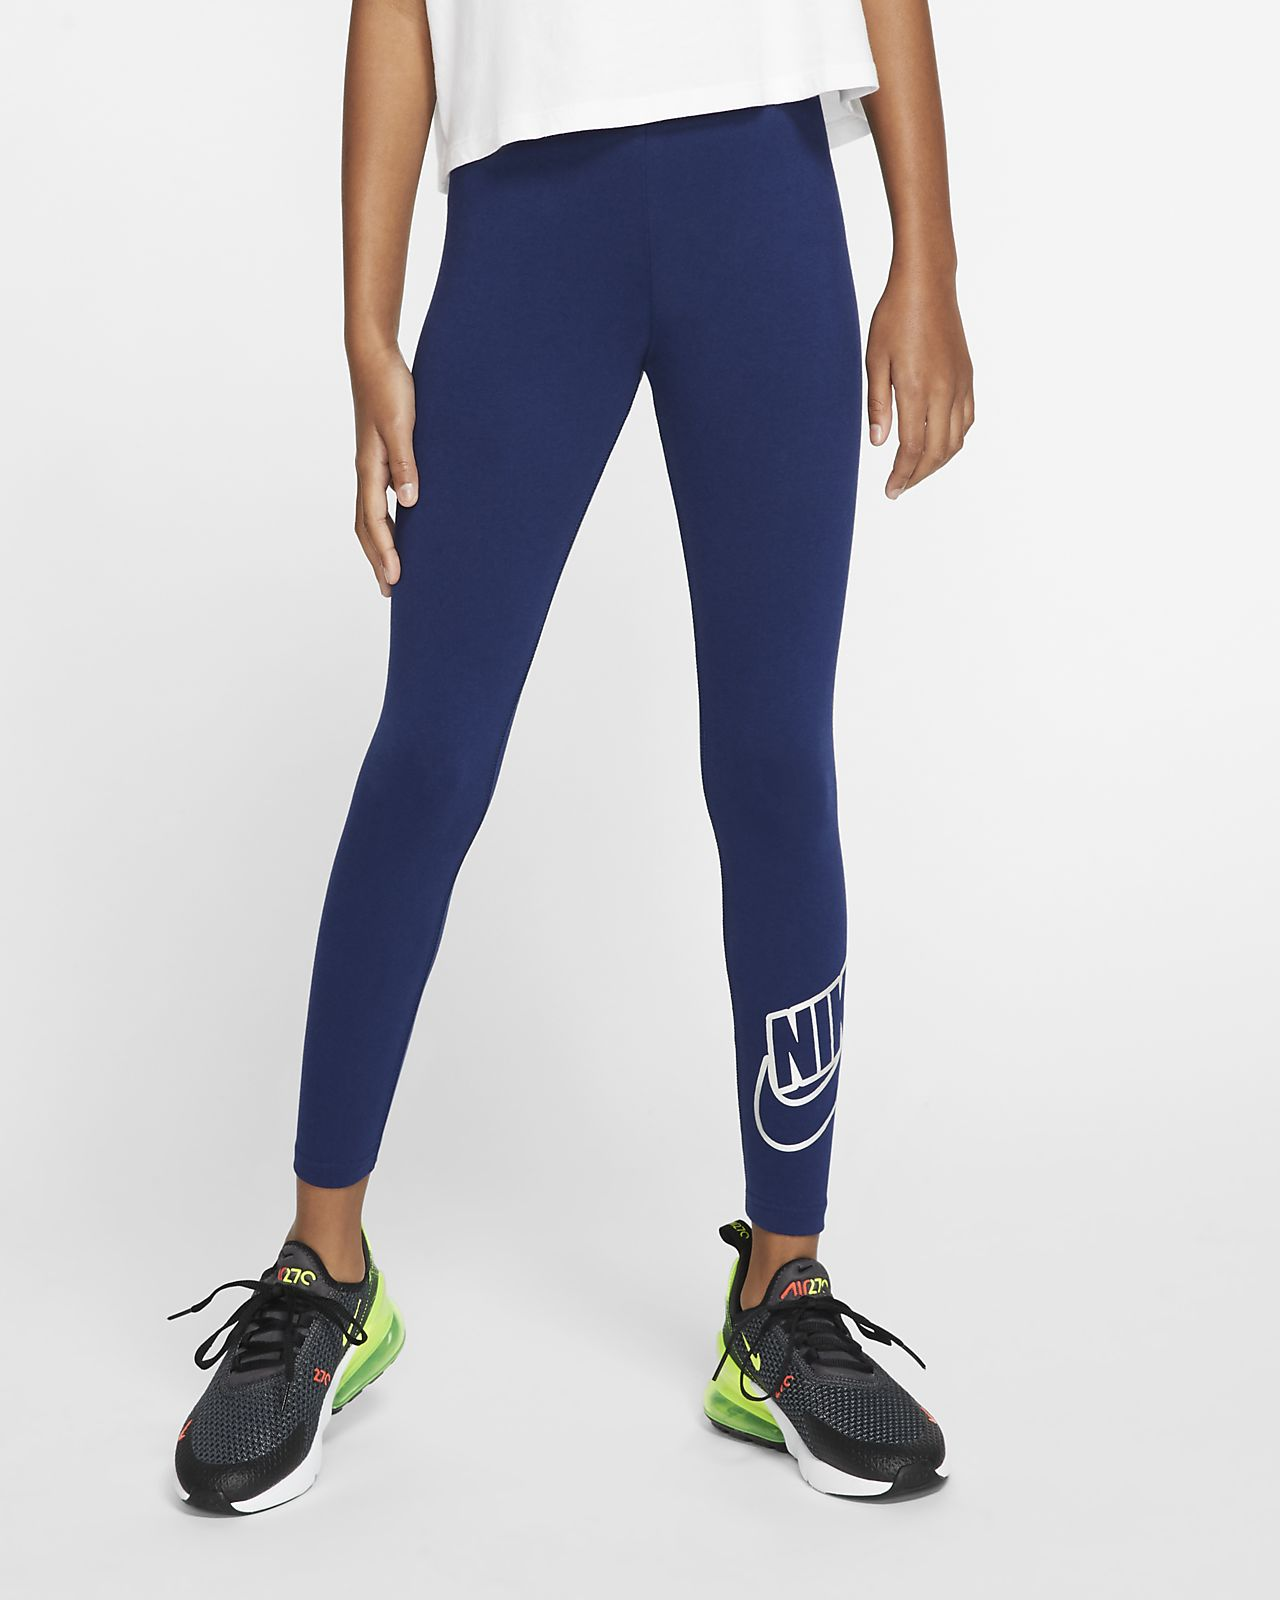 Collant Nike Sportswear pour Fille plus âgée